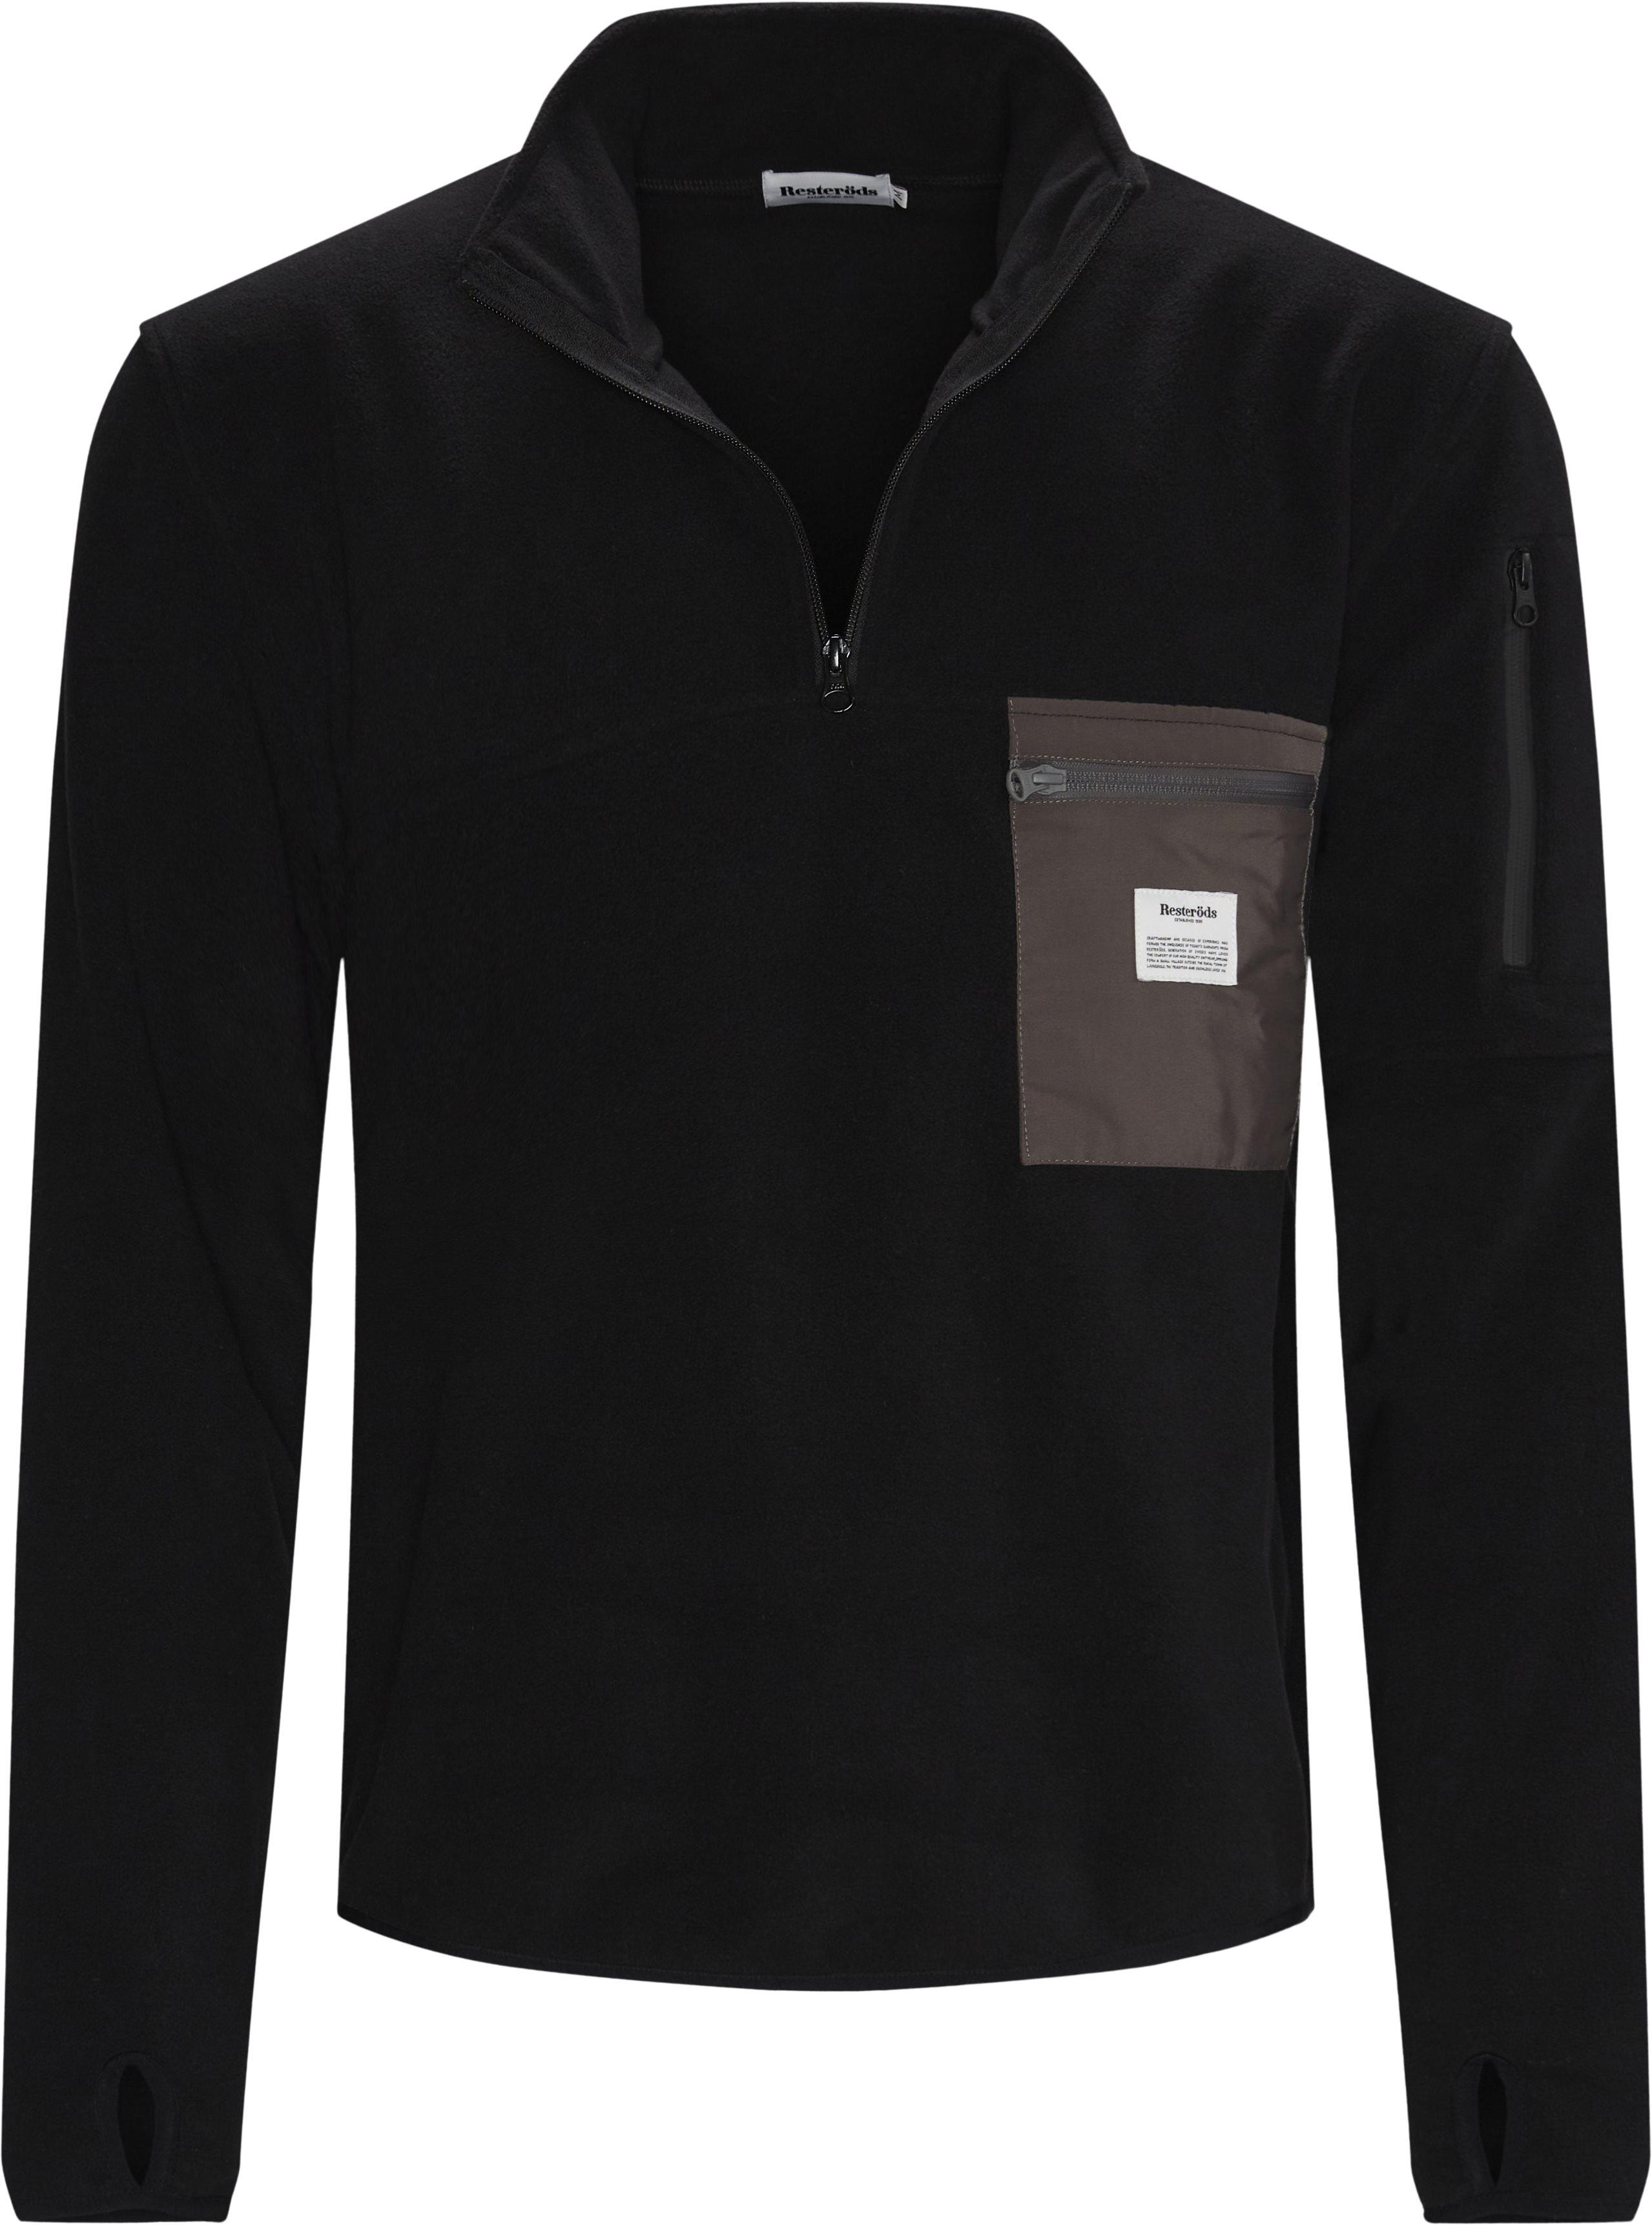 Pullover Fleece Anorak - Jackor - Regular - Svart